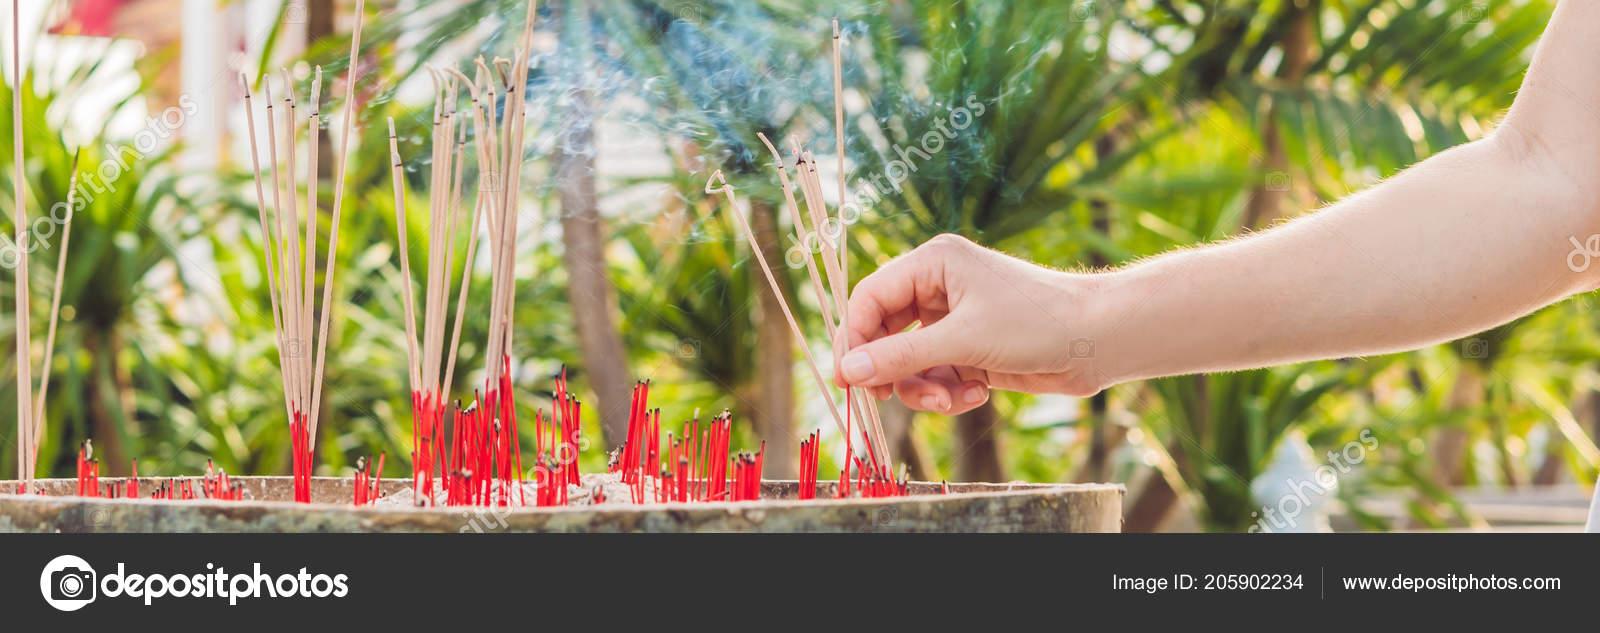 Smell Smoke Incense Smoke Joss Stick Temple Smoke Incense Spirit